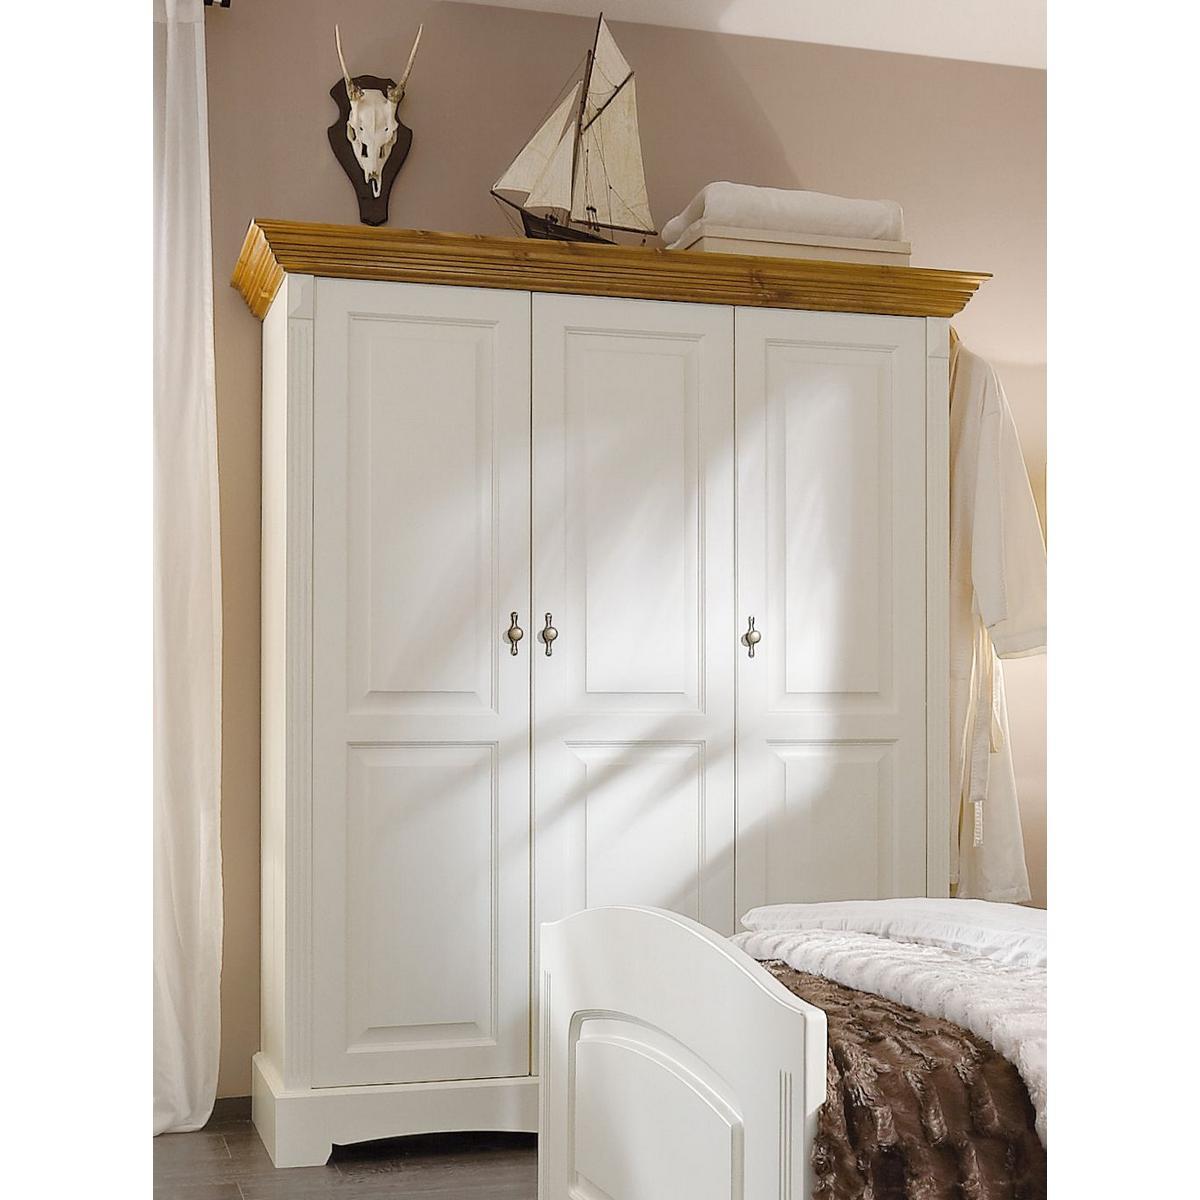 landhausstil 2 t rig holz kiefer massiv goldbraun lackiert paris pictures to pin on pinterest. Black Bedroom Furniture Sets. Home Design Ideas